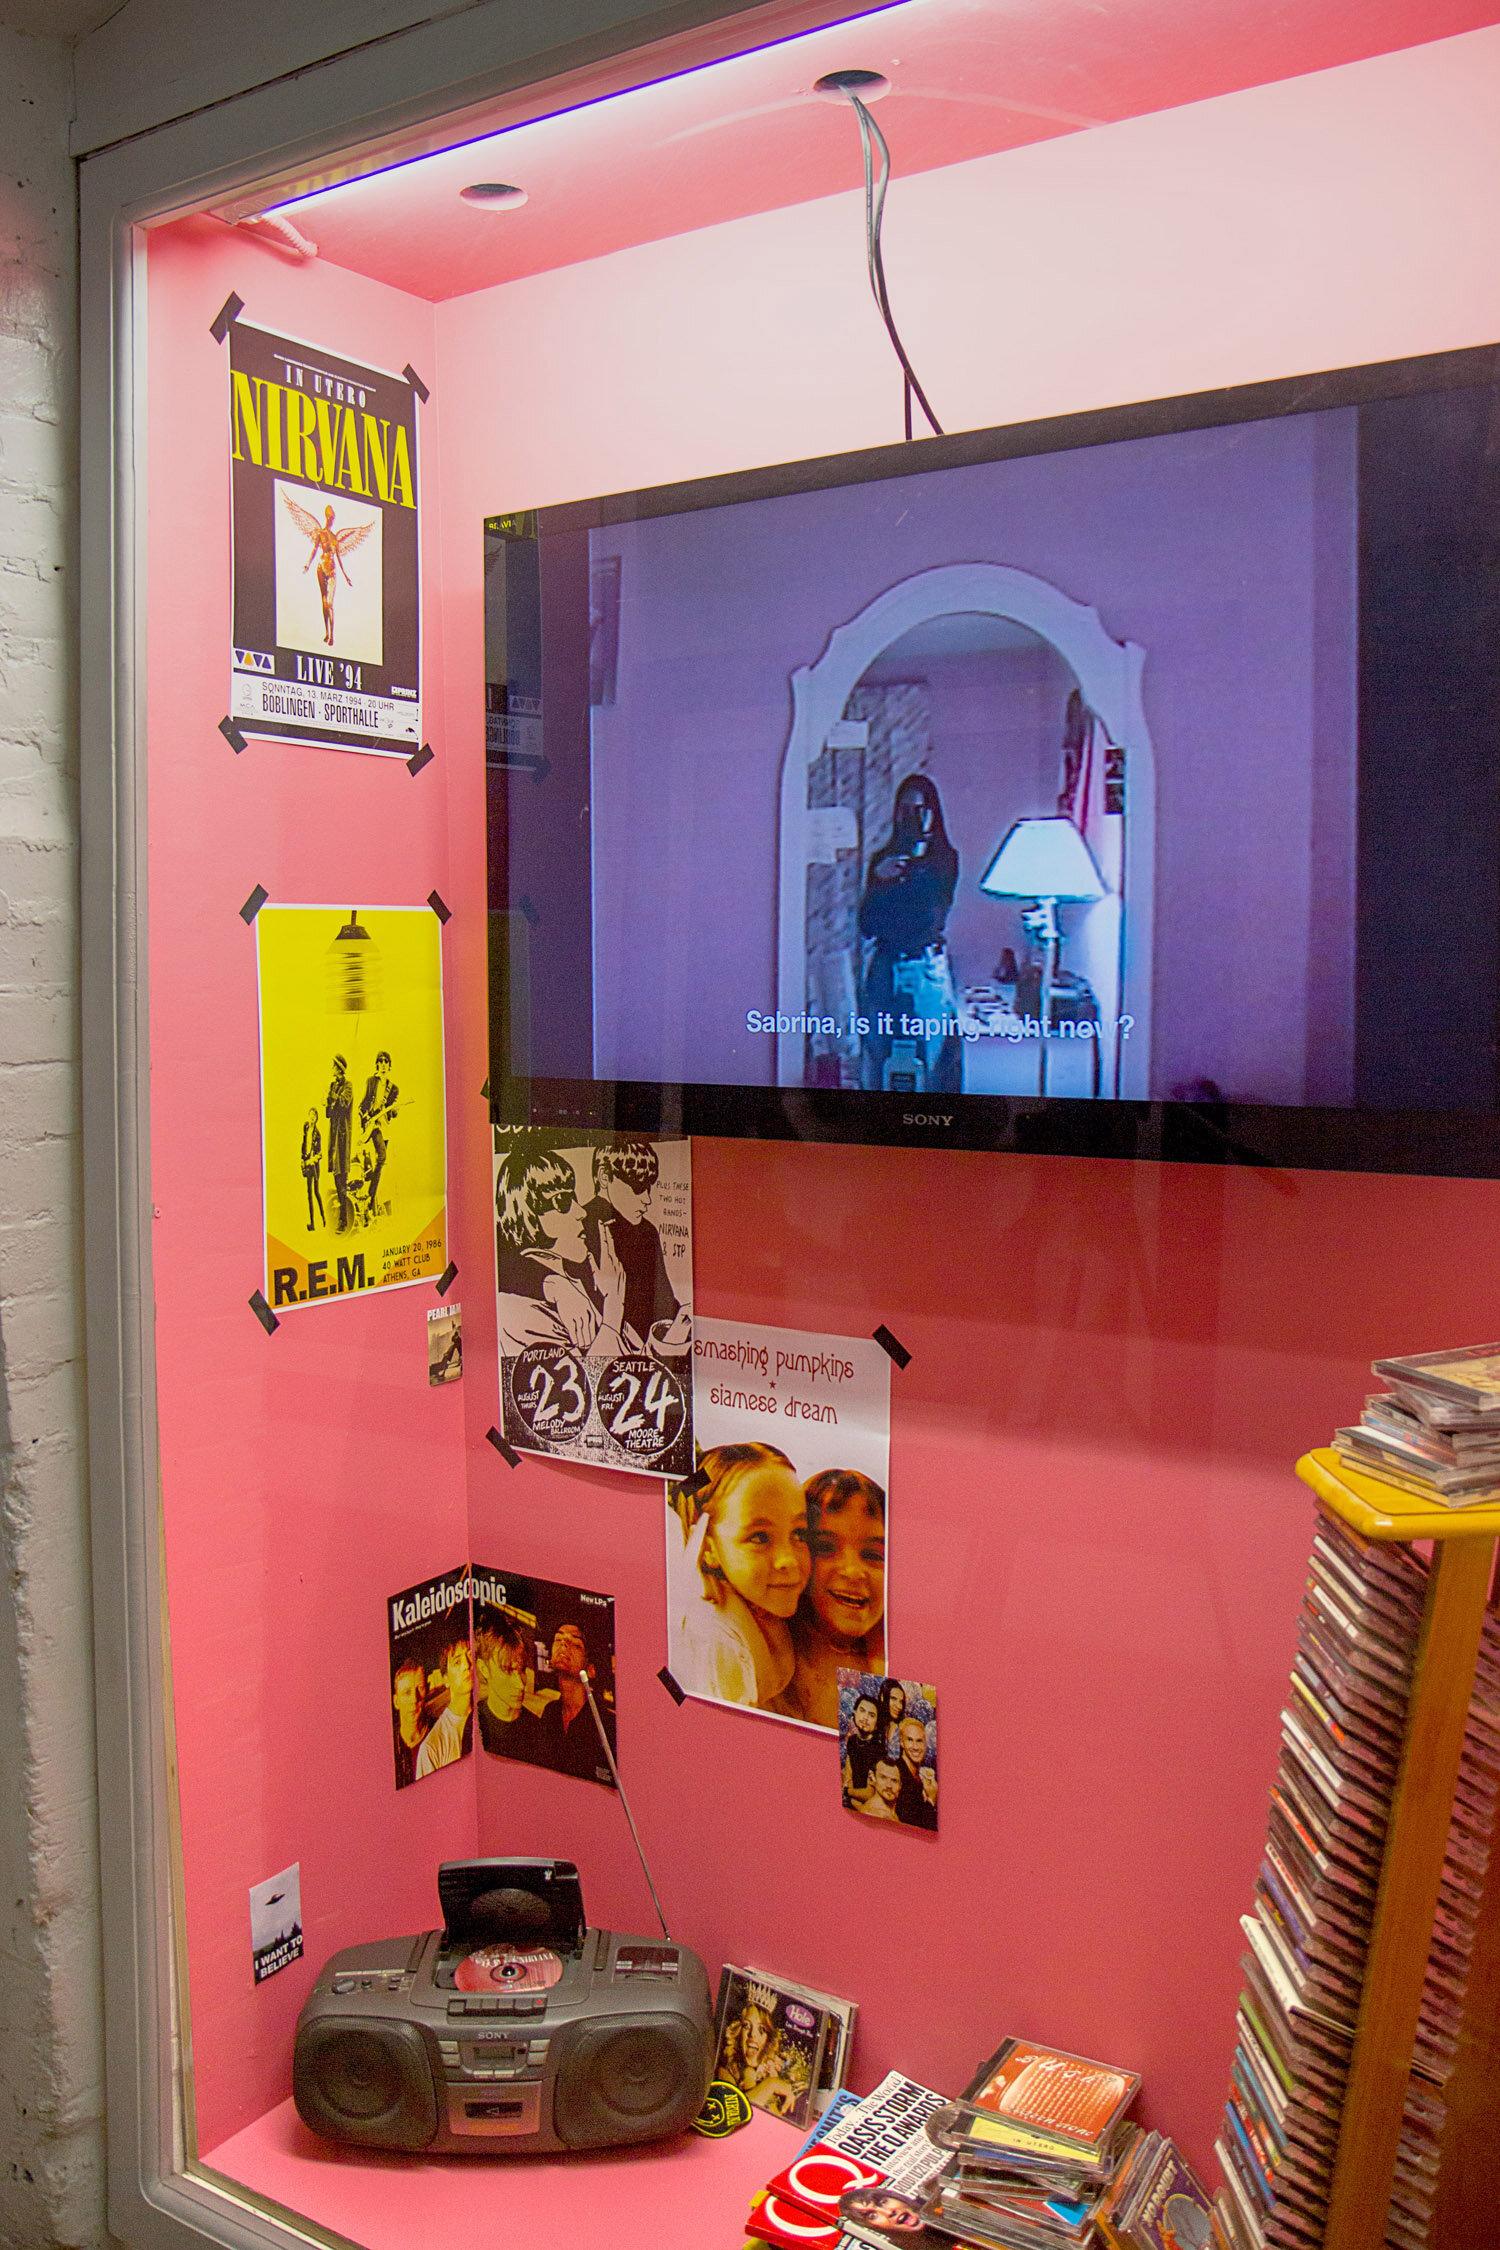 Installation views in Trinity Square Video's vitrine space, Toronto 2017.